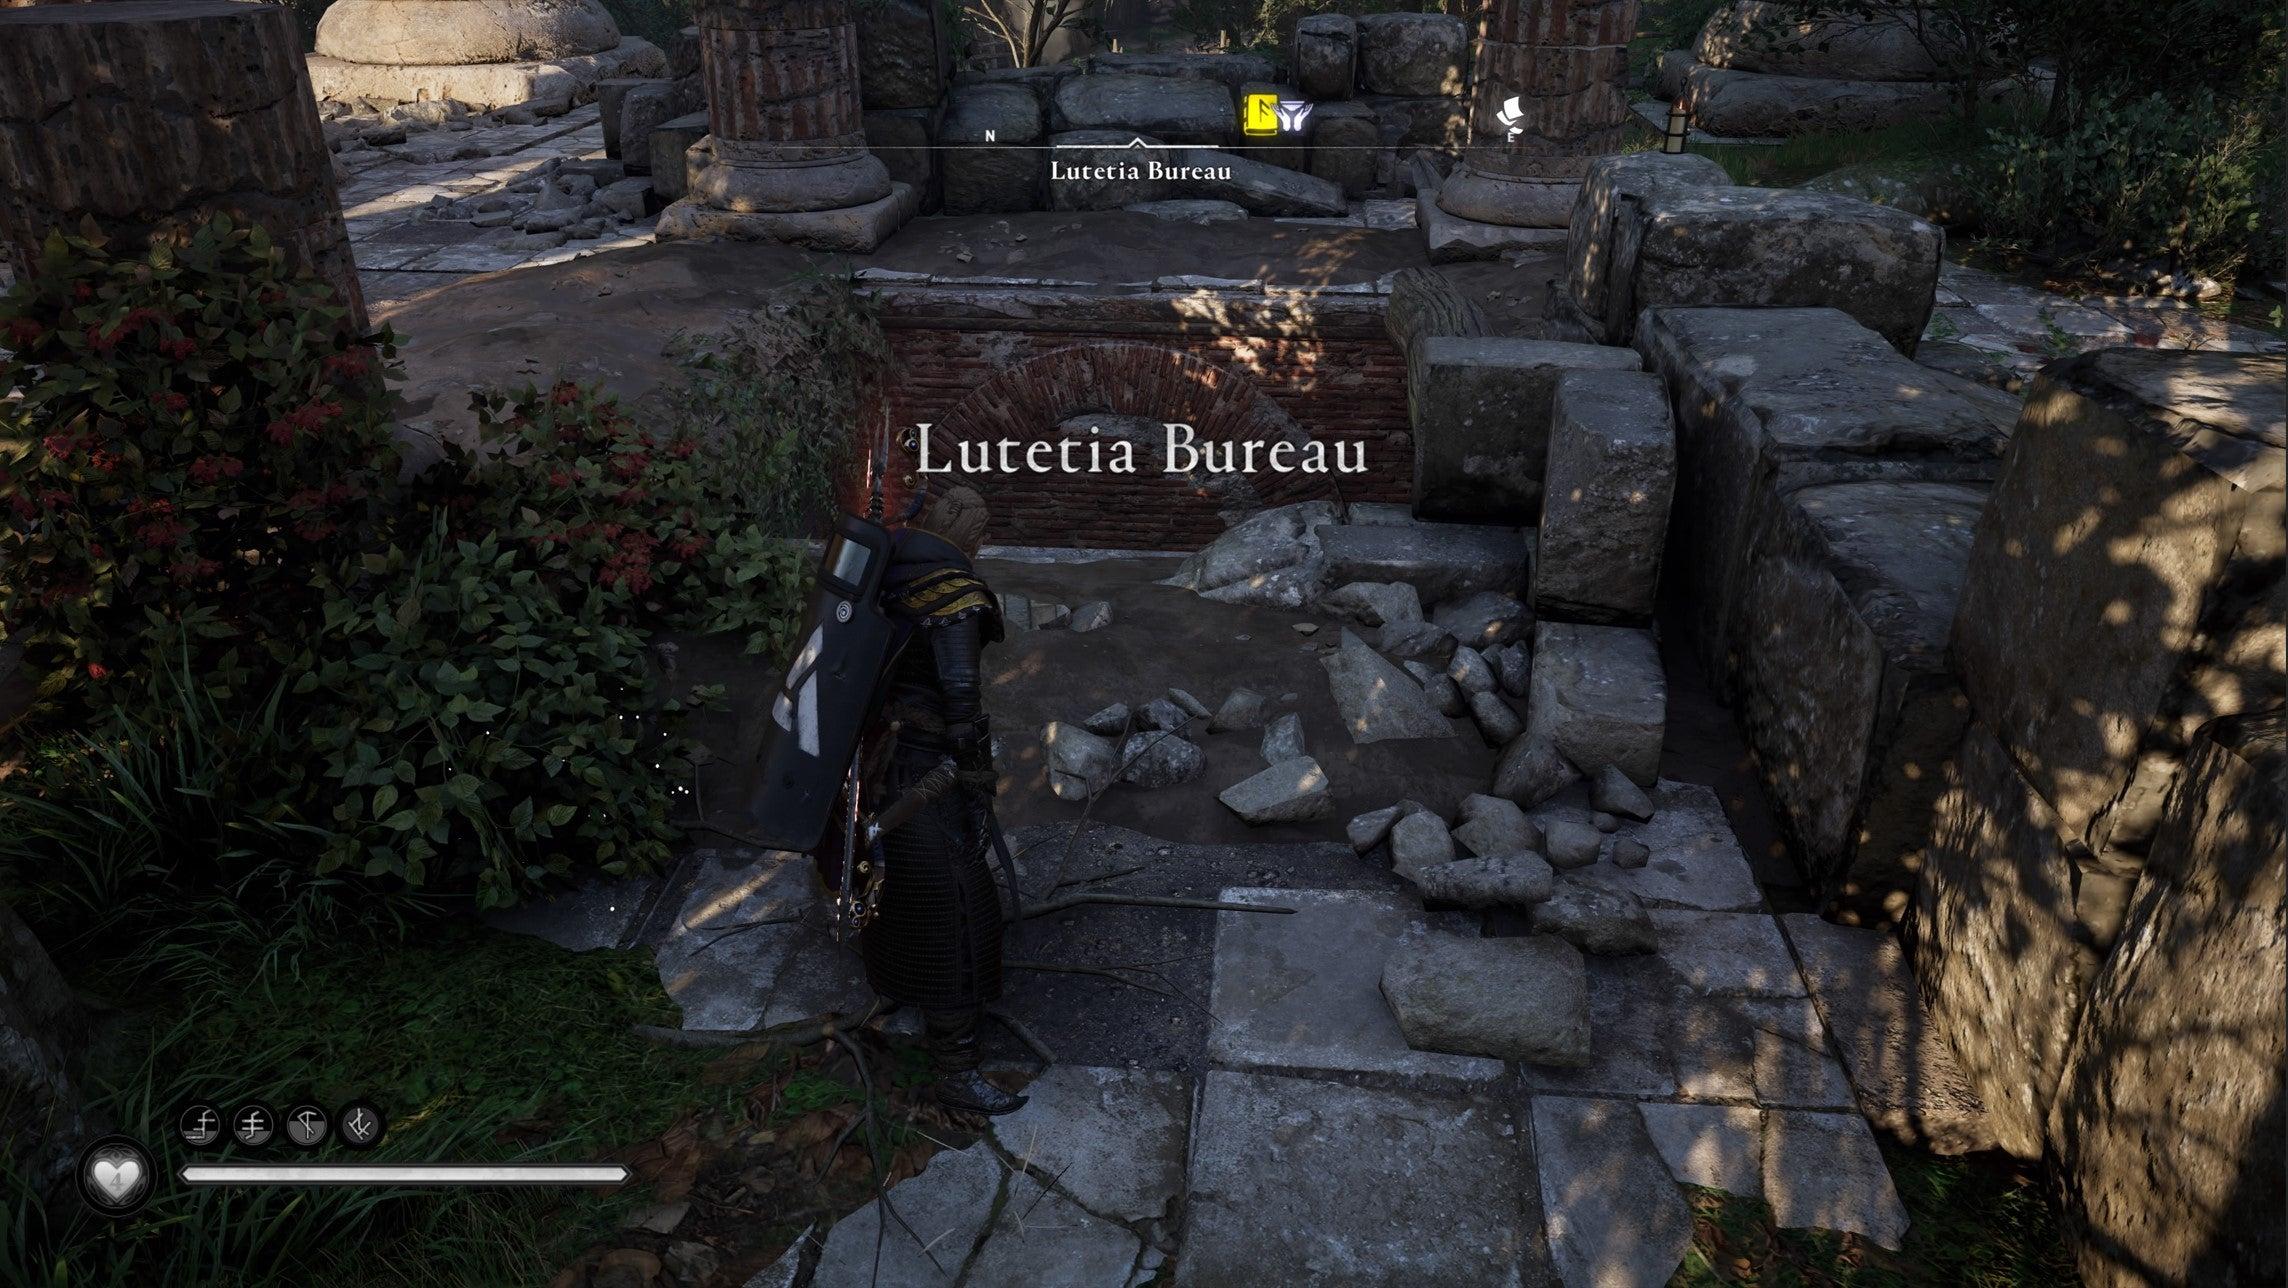 Image for Assassin's Creed Valhalla Siege of Paris Hidden Quest | Roman Excavation solutions